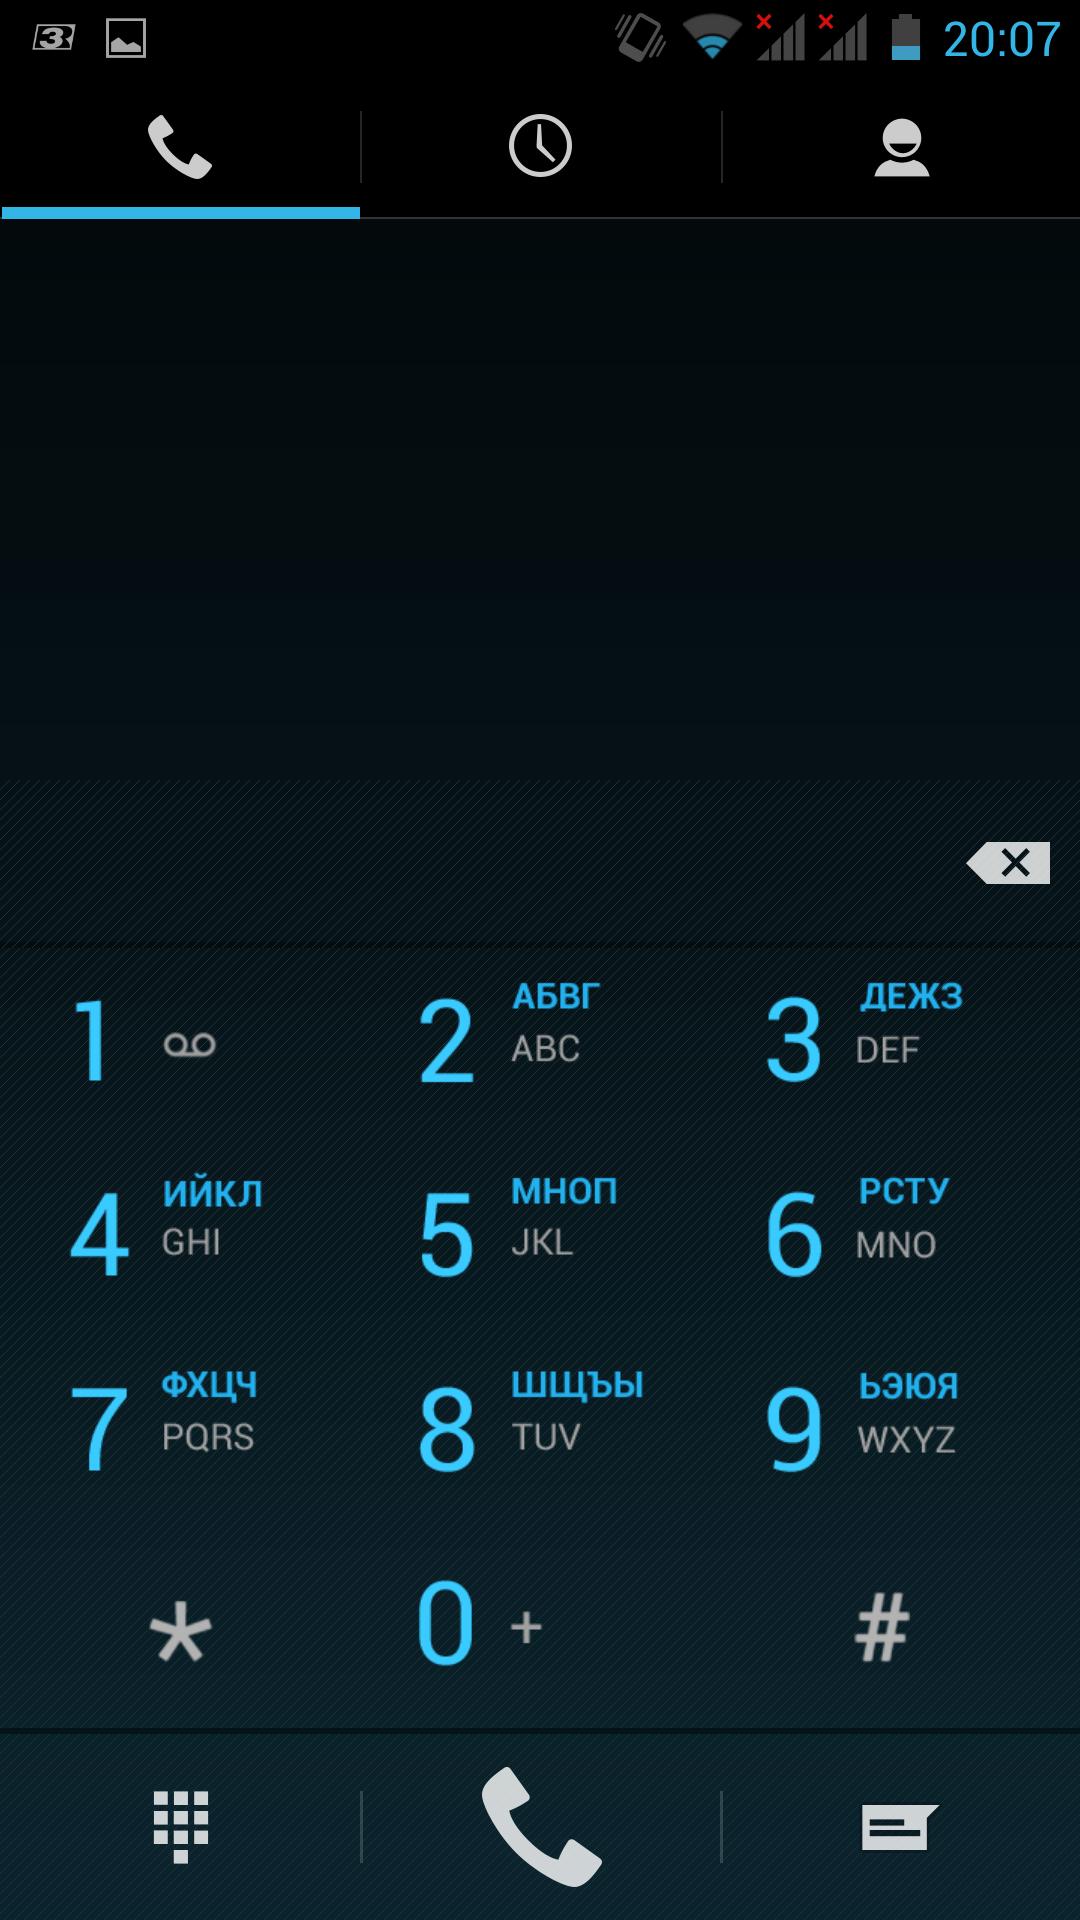 Screenshot_2014-07-11-20-07-30